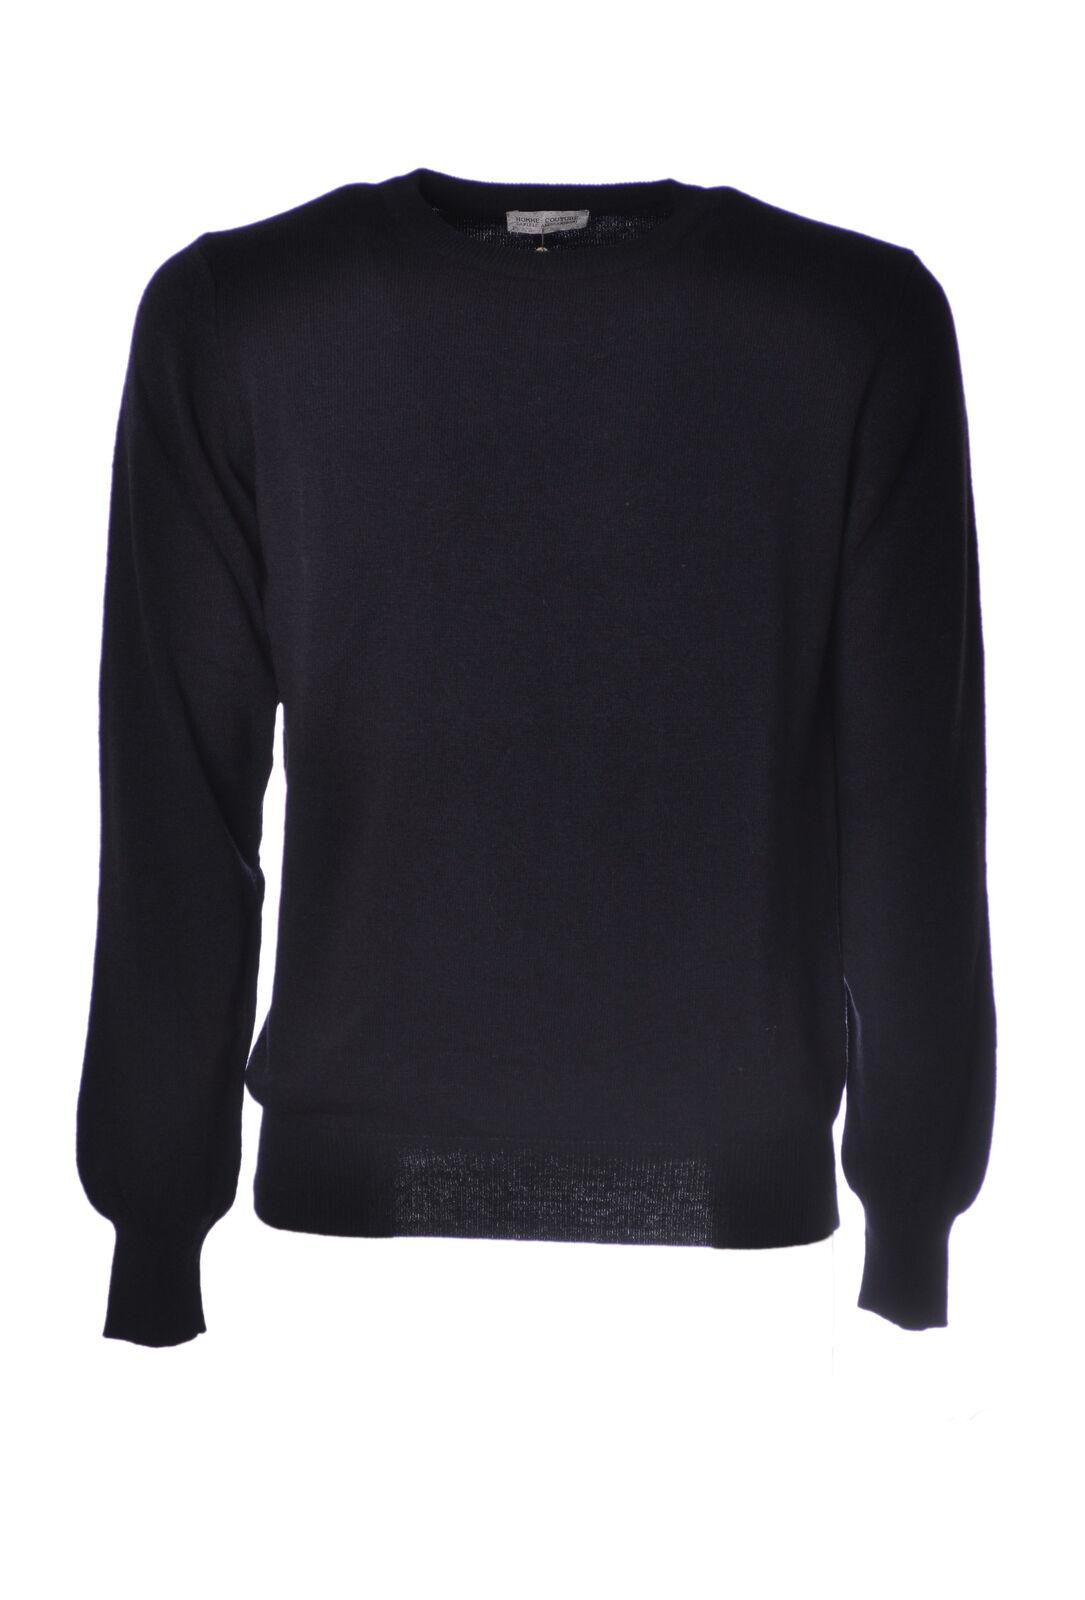 Daniele Alessandrini  -  Sweaters - Male - bluee - 4612022A182101